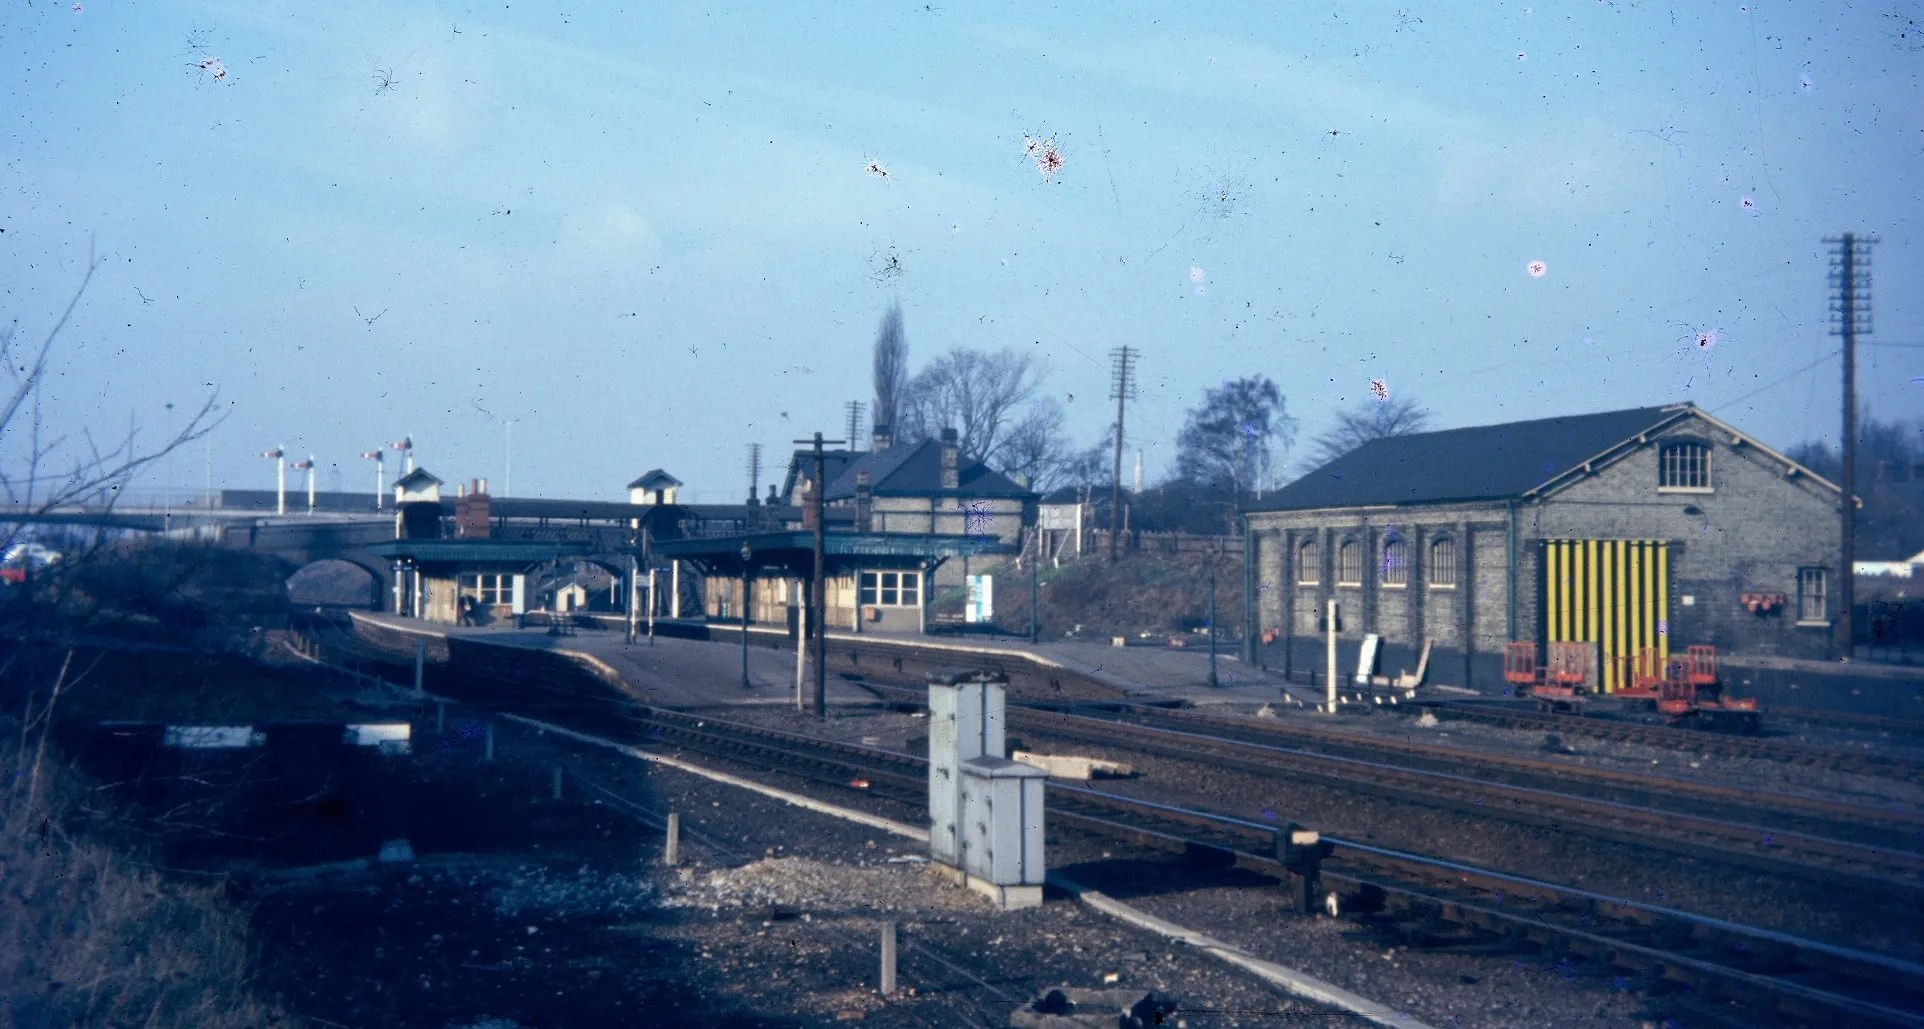 Stevenage Railway Station